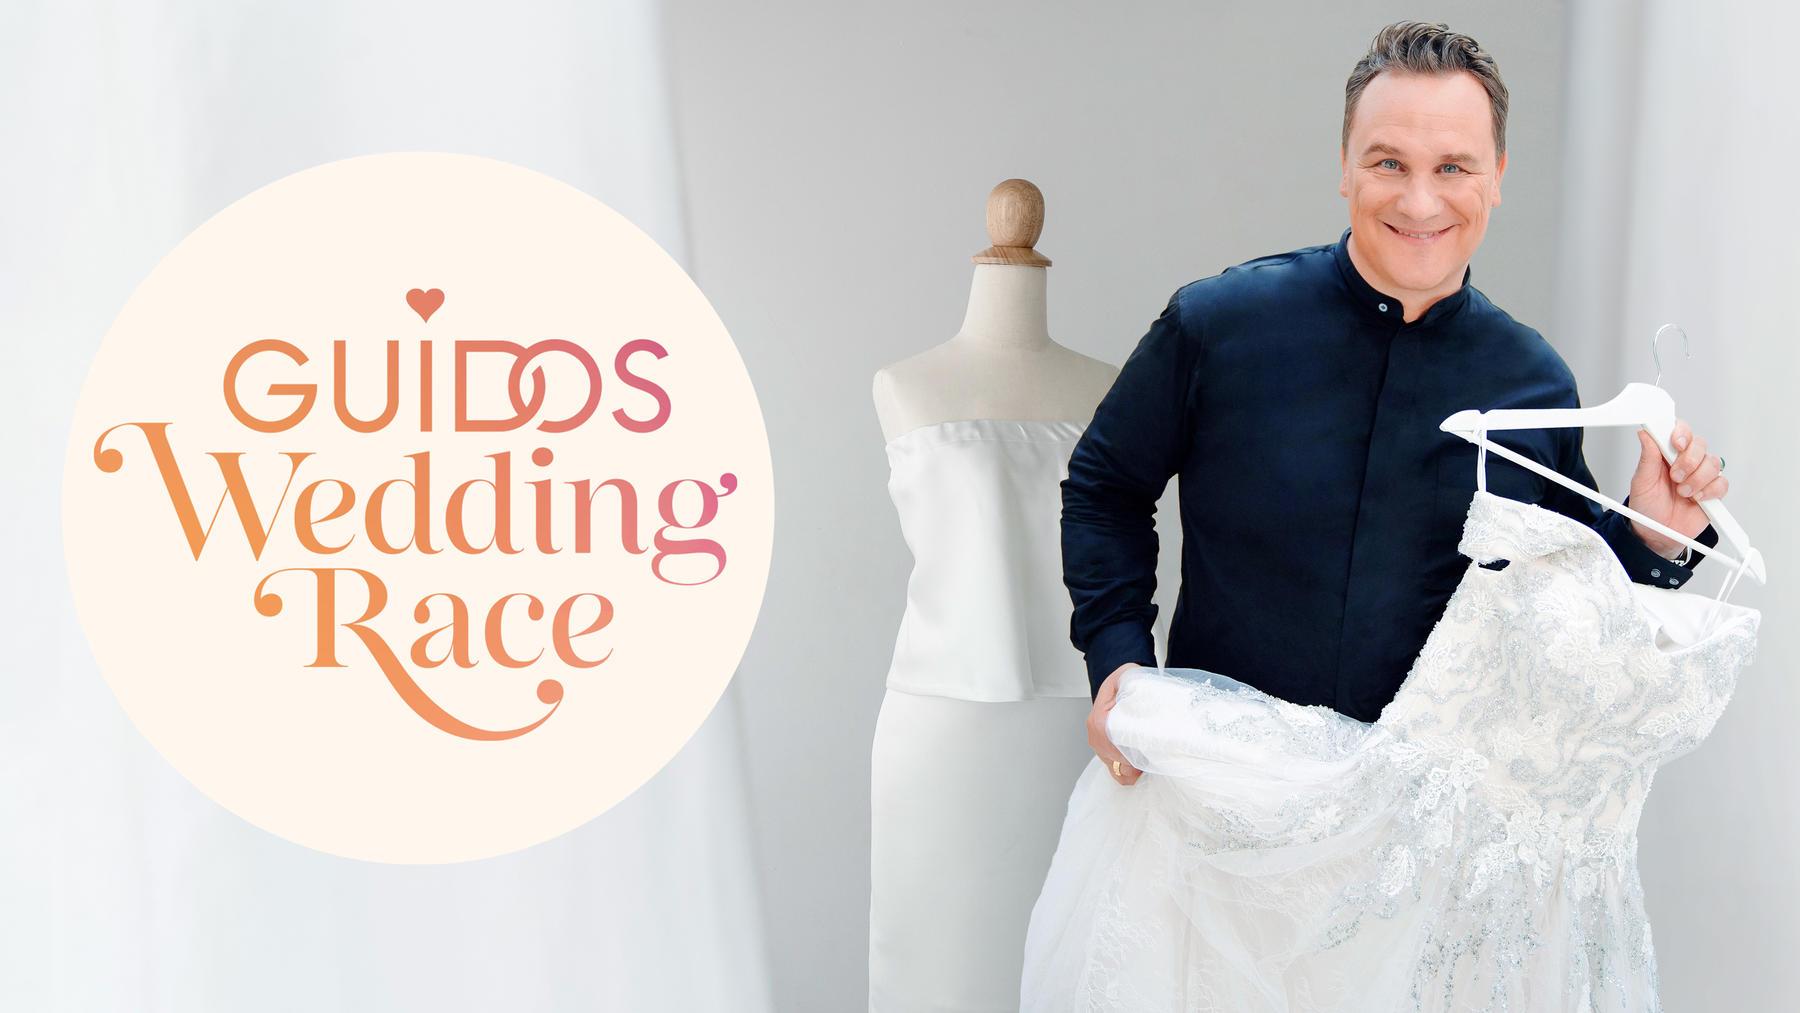 Guidos Wedding Race